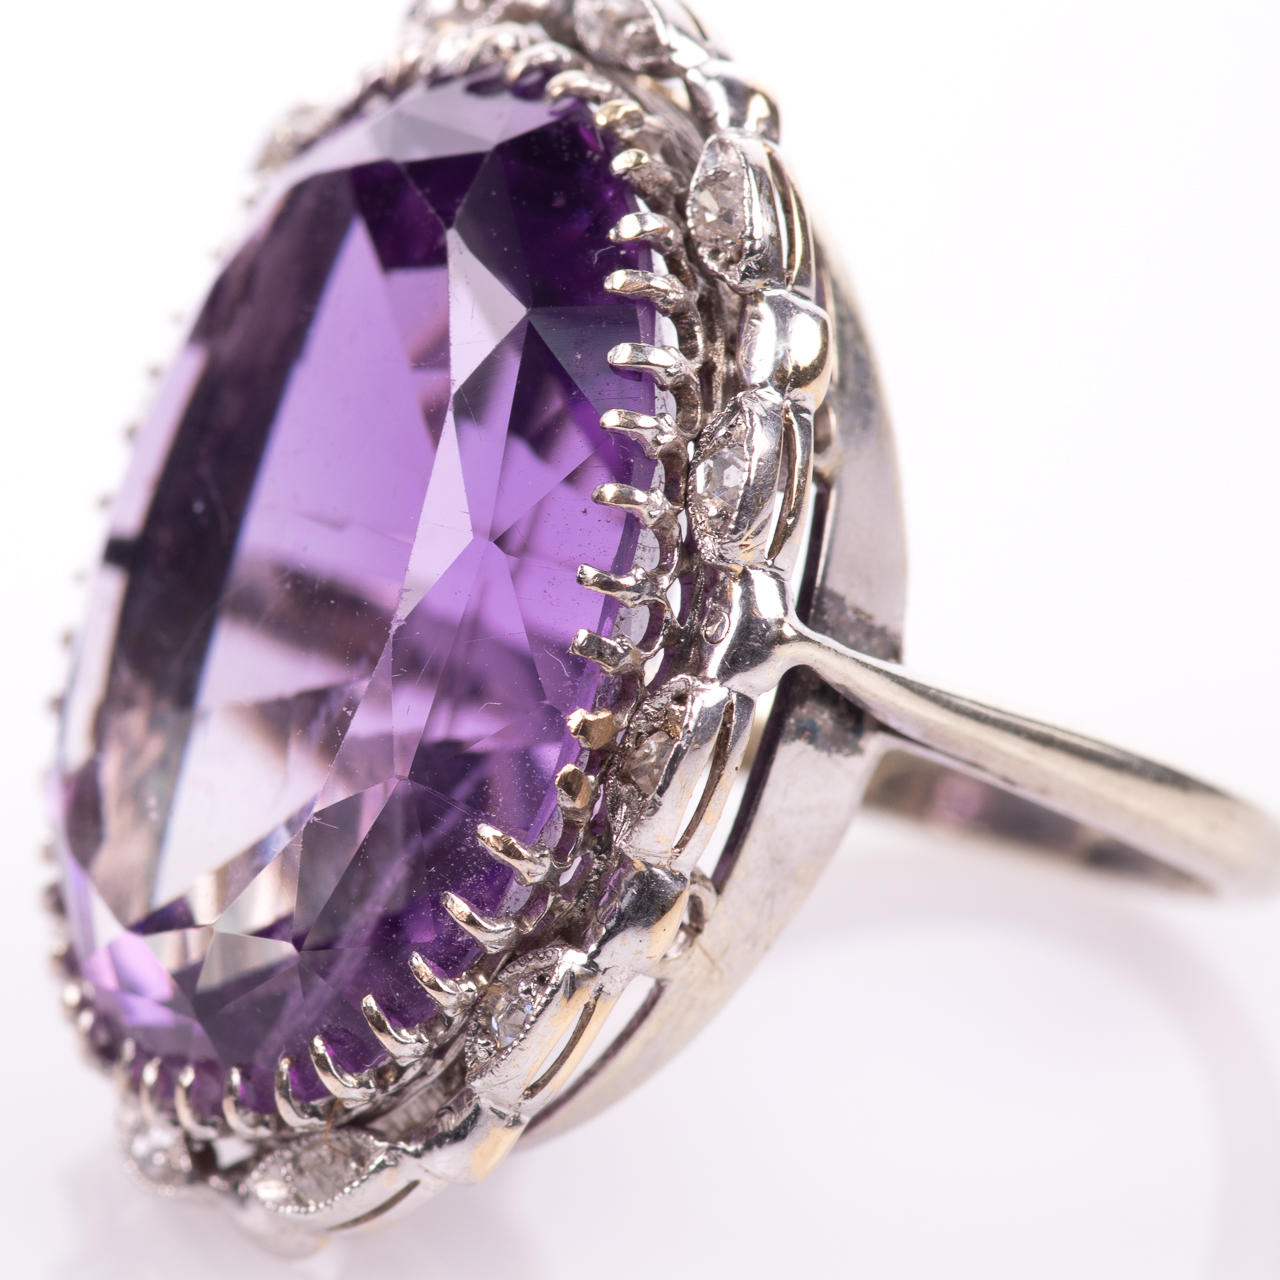 30ct Amethyst & Diamond Ring - Image 4 of 6